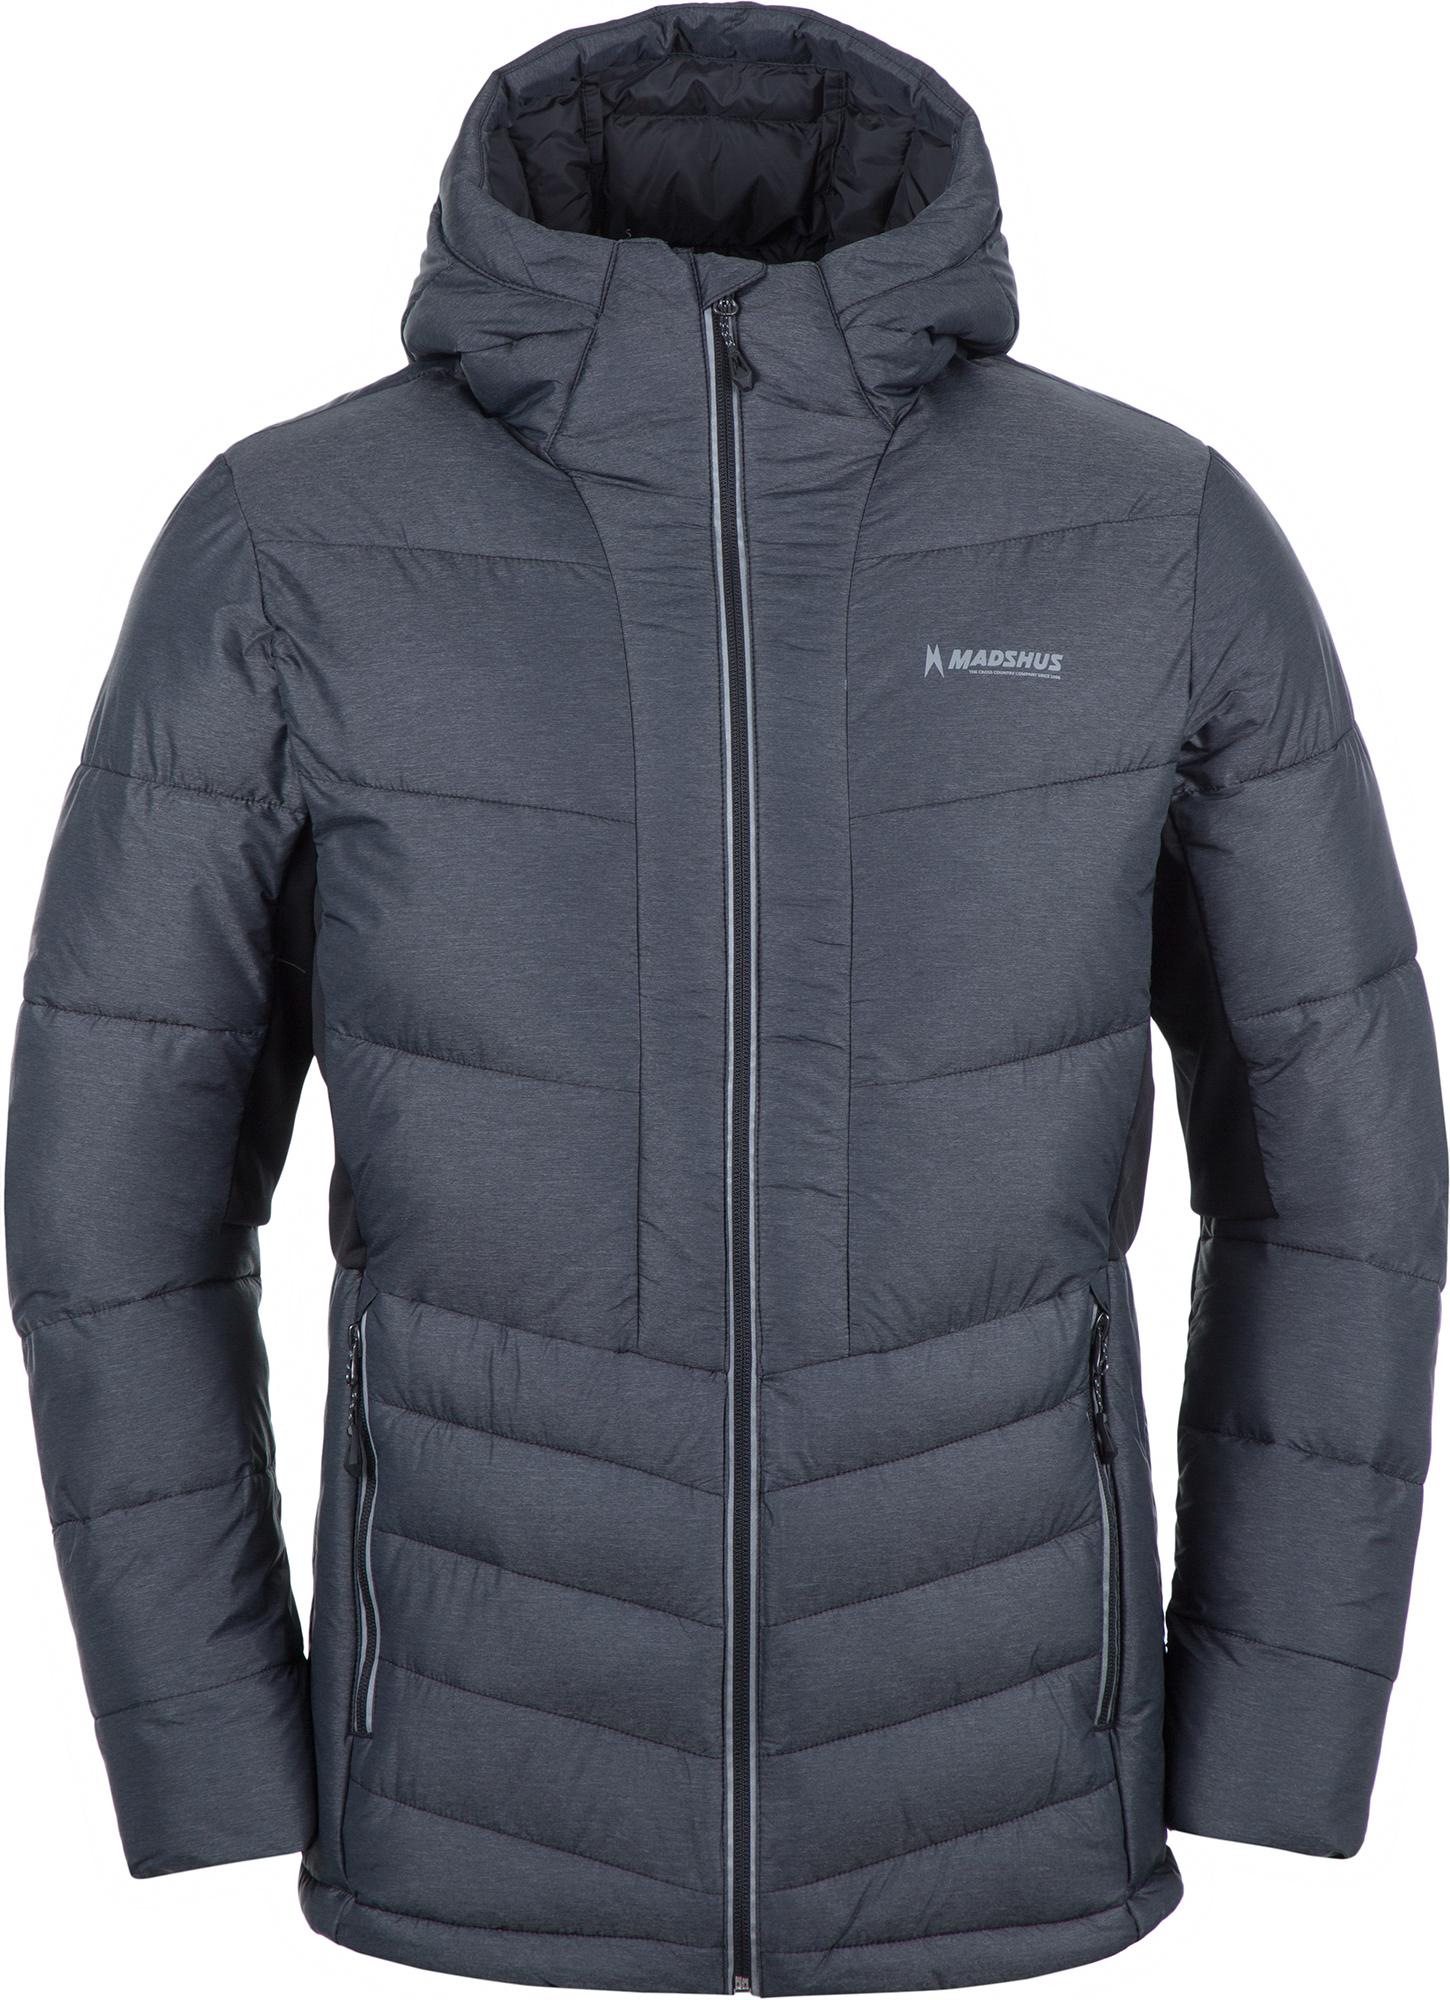 Madshus Куртка утепленная мужская Madshus, размер 56 madshus ботинки для беговых лыж madshus ct 90 размер 43